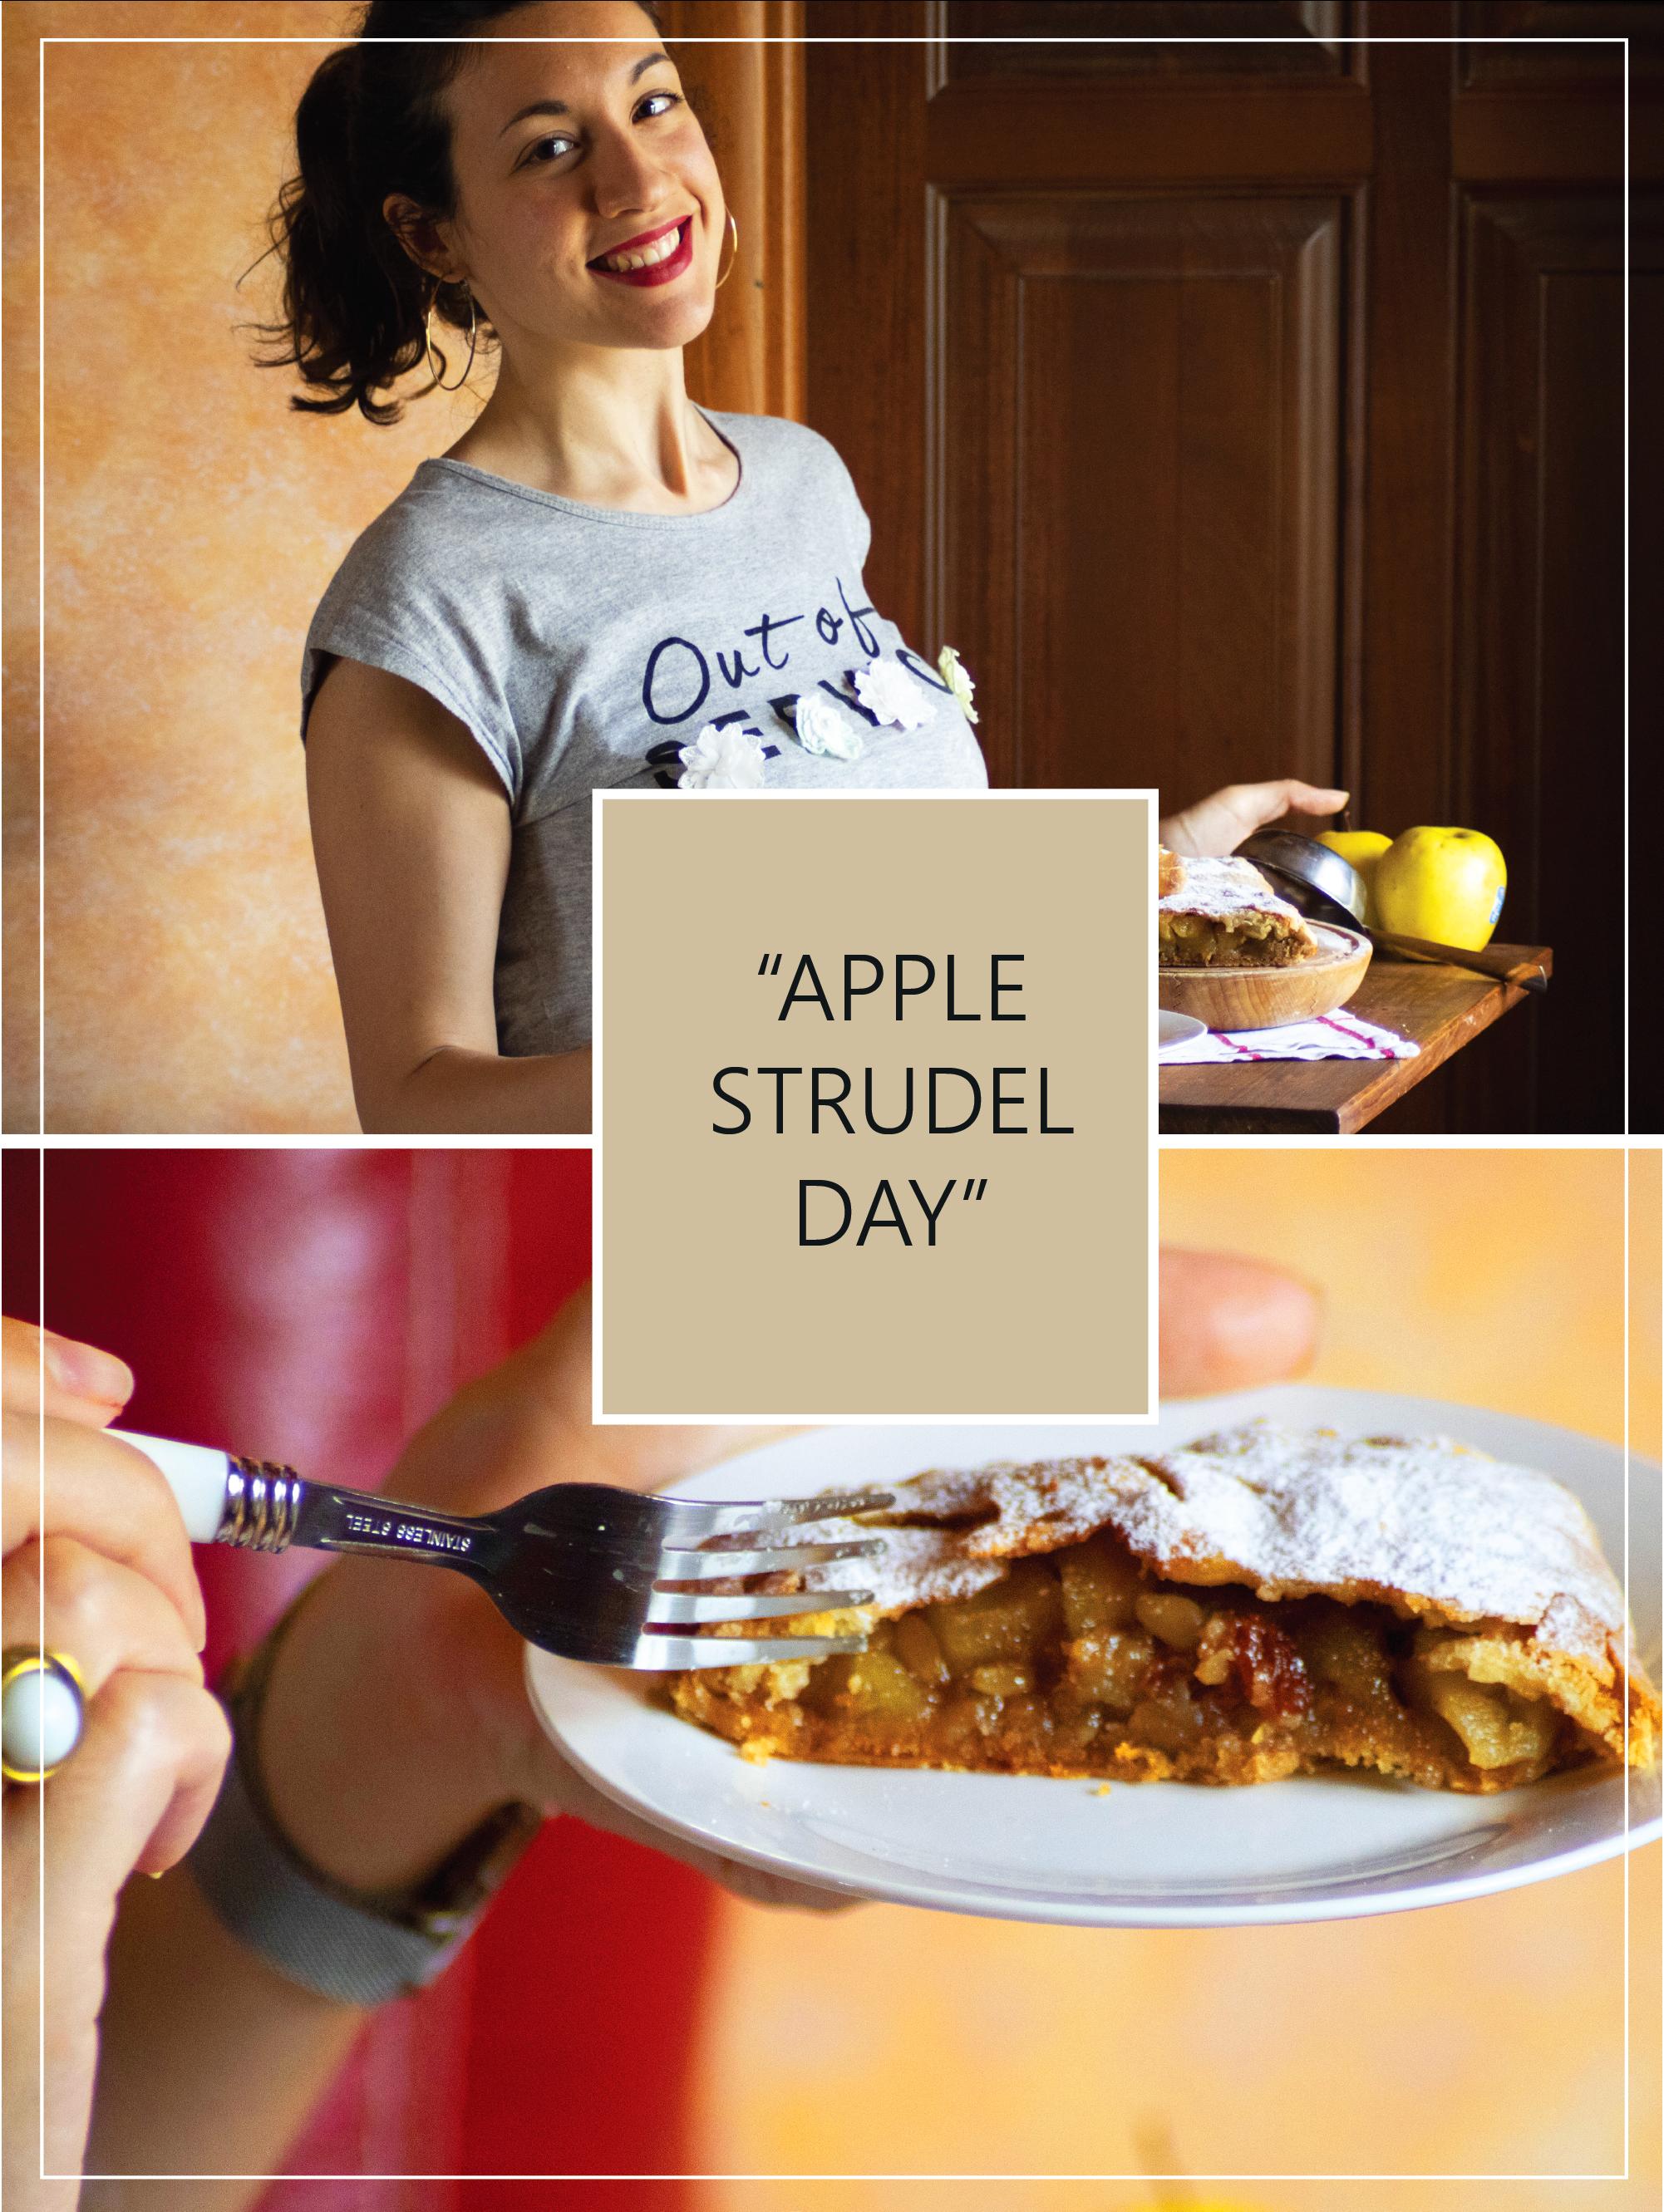 Apple Strudel day